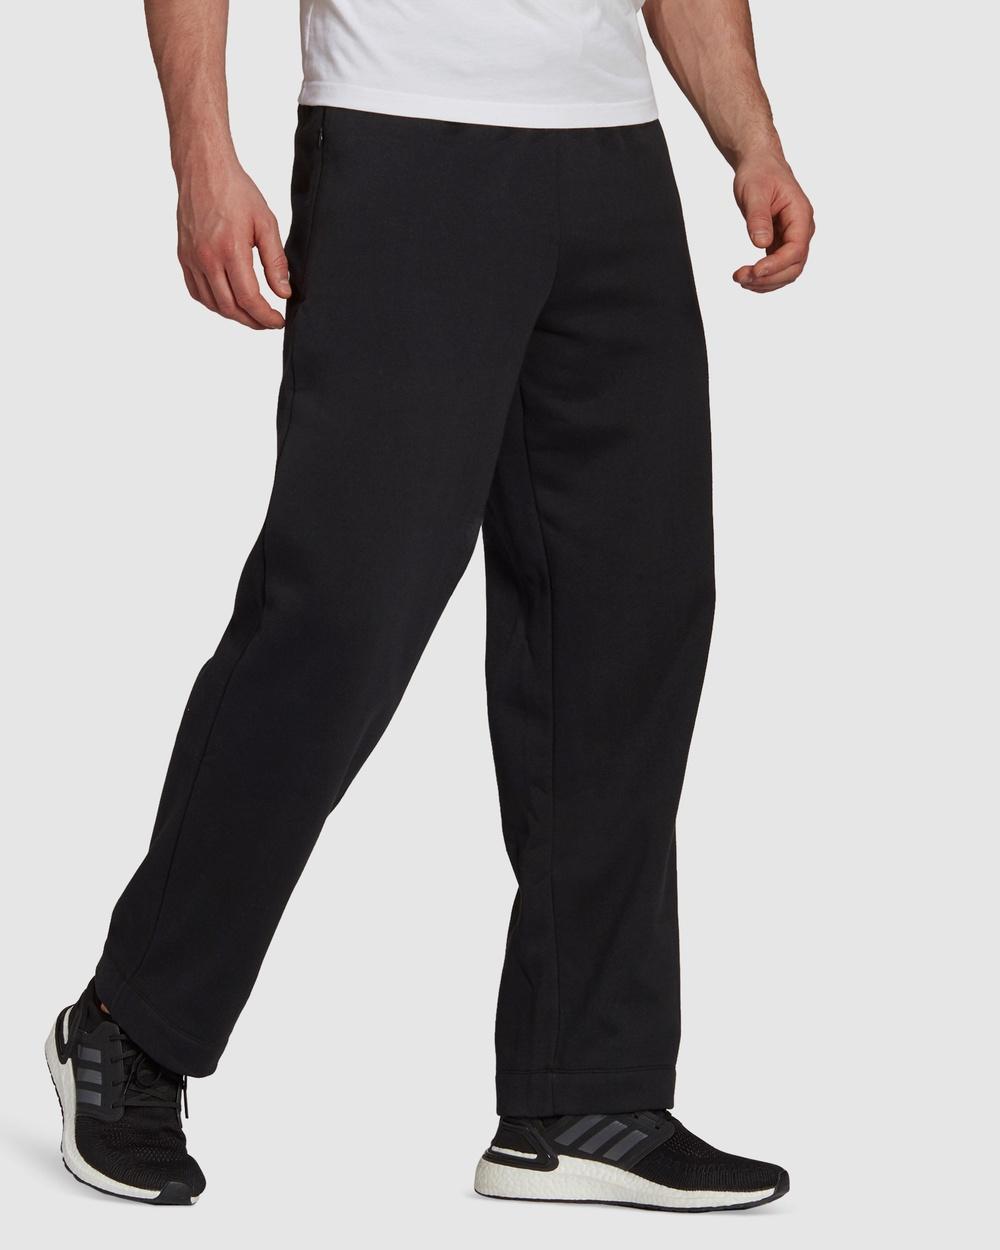 adidas Performance Sportswear Comfy and Chill Fleece Pants Black